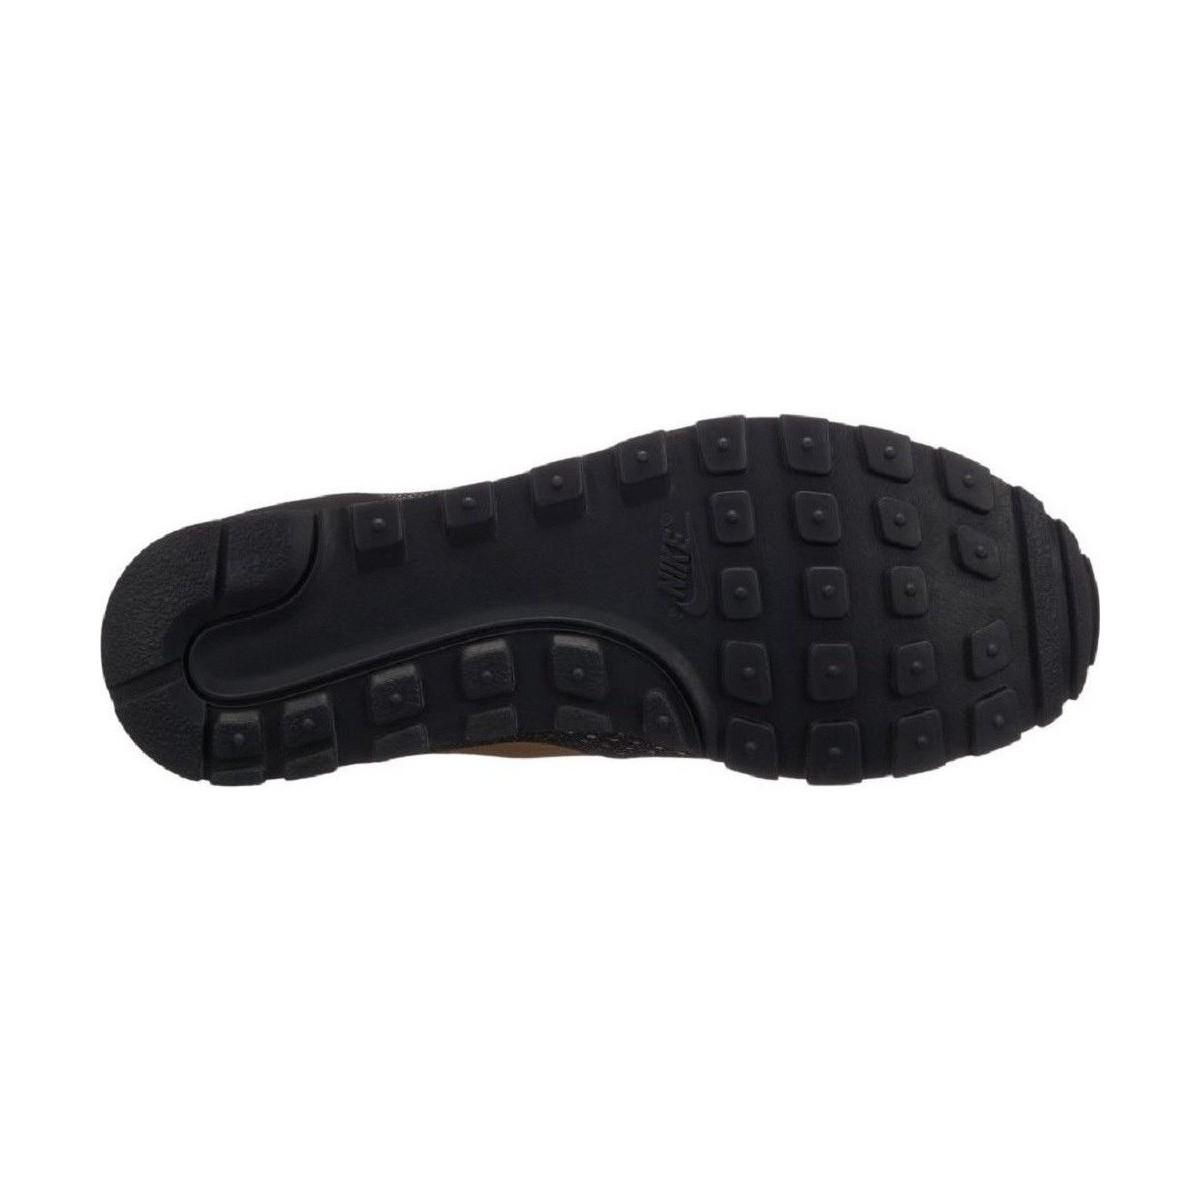 Nike - Md Runner 2 Eng Mesh 916797 007 Women s Shoes (trainers) In Black.  View fullscreen 8005efa5fb063